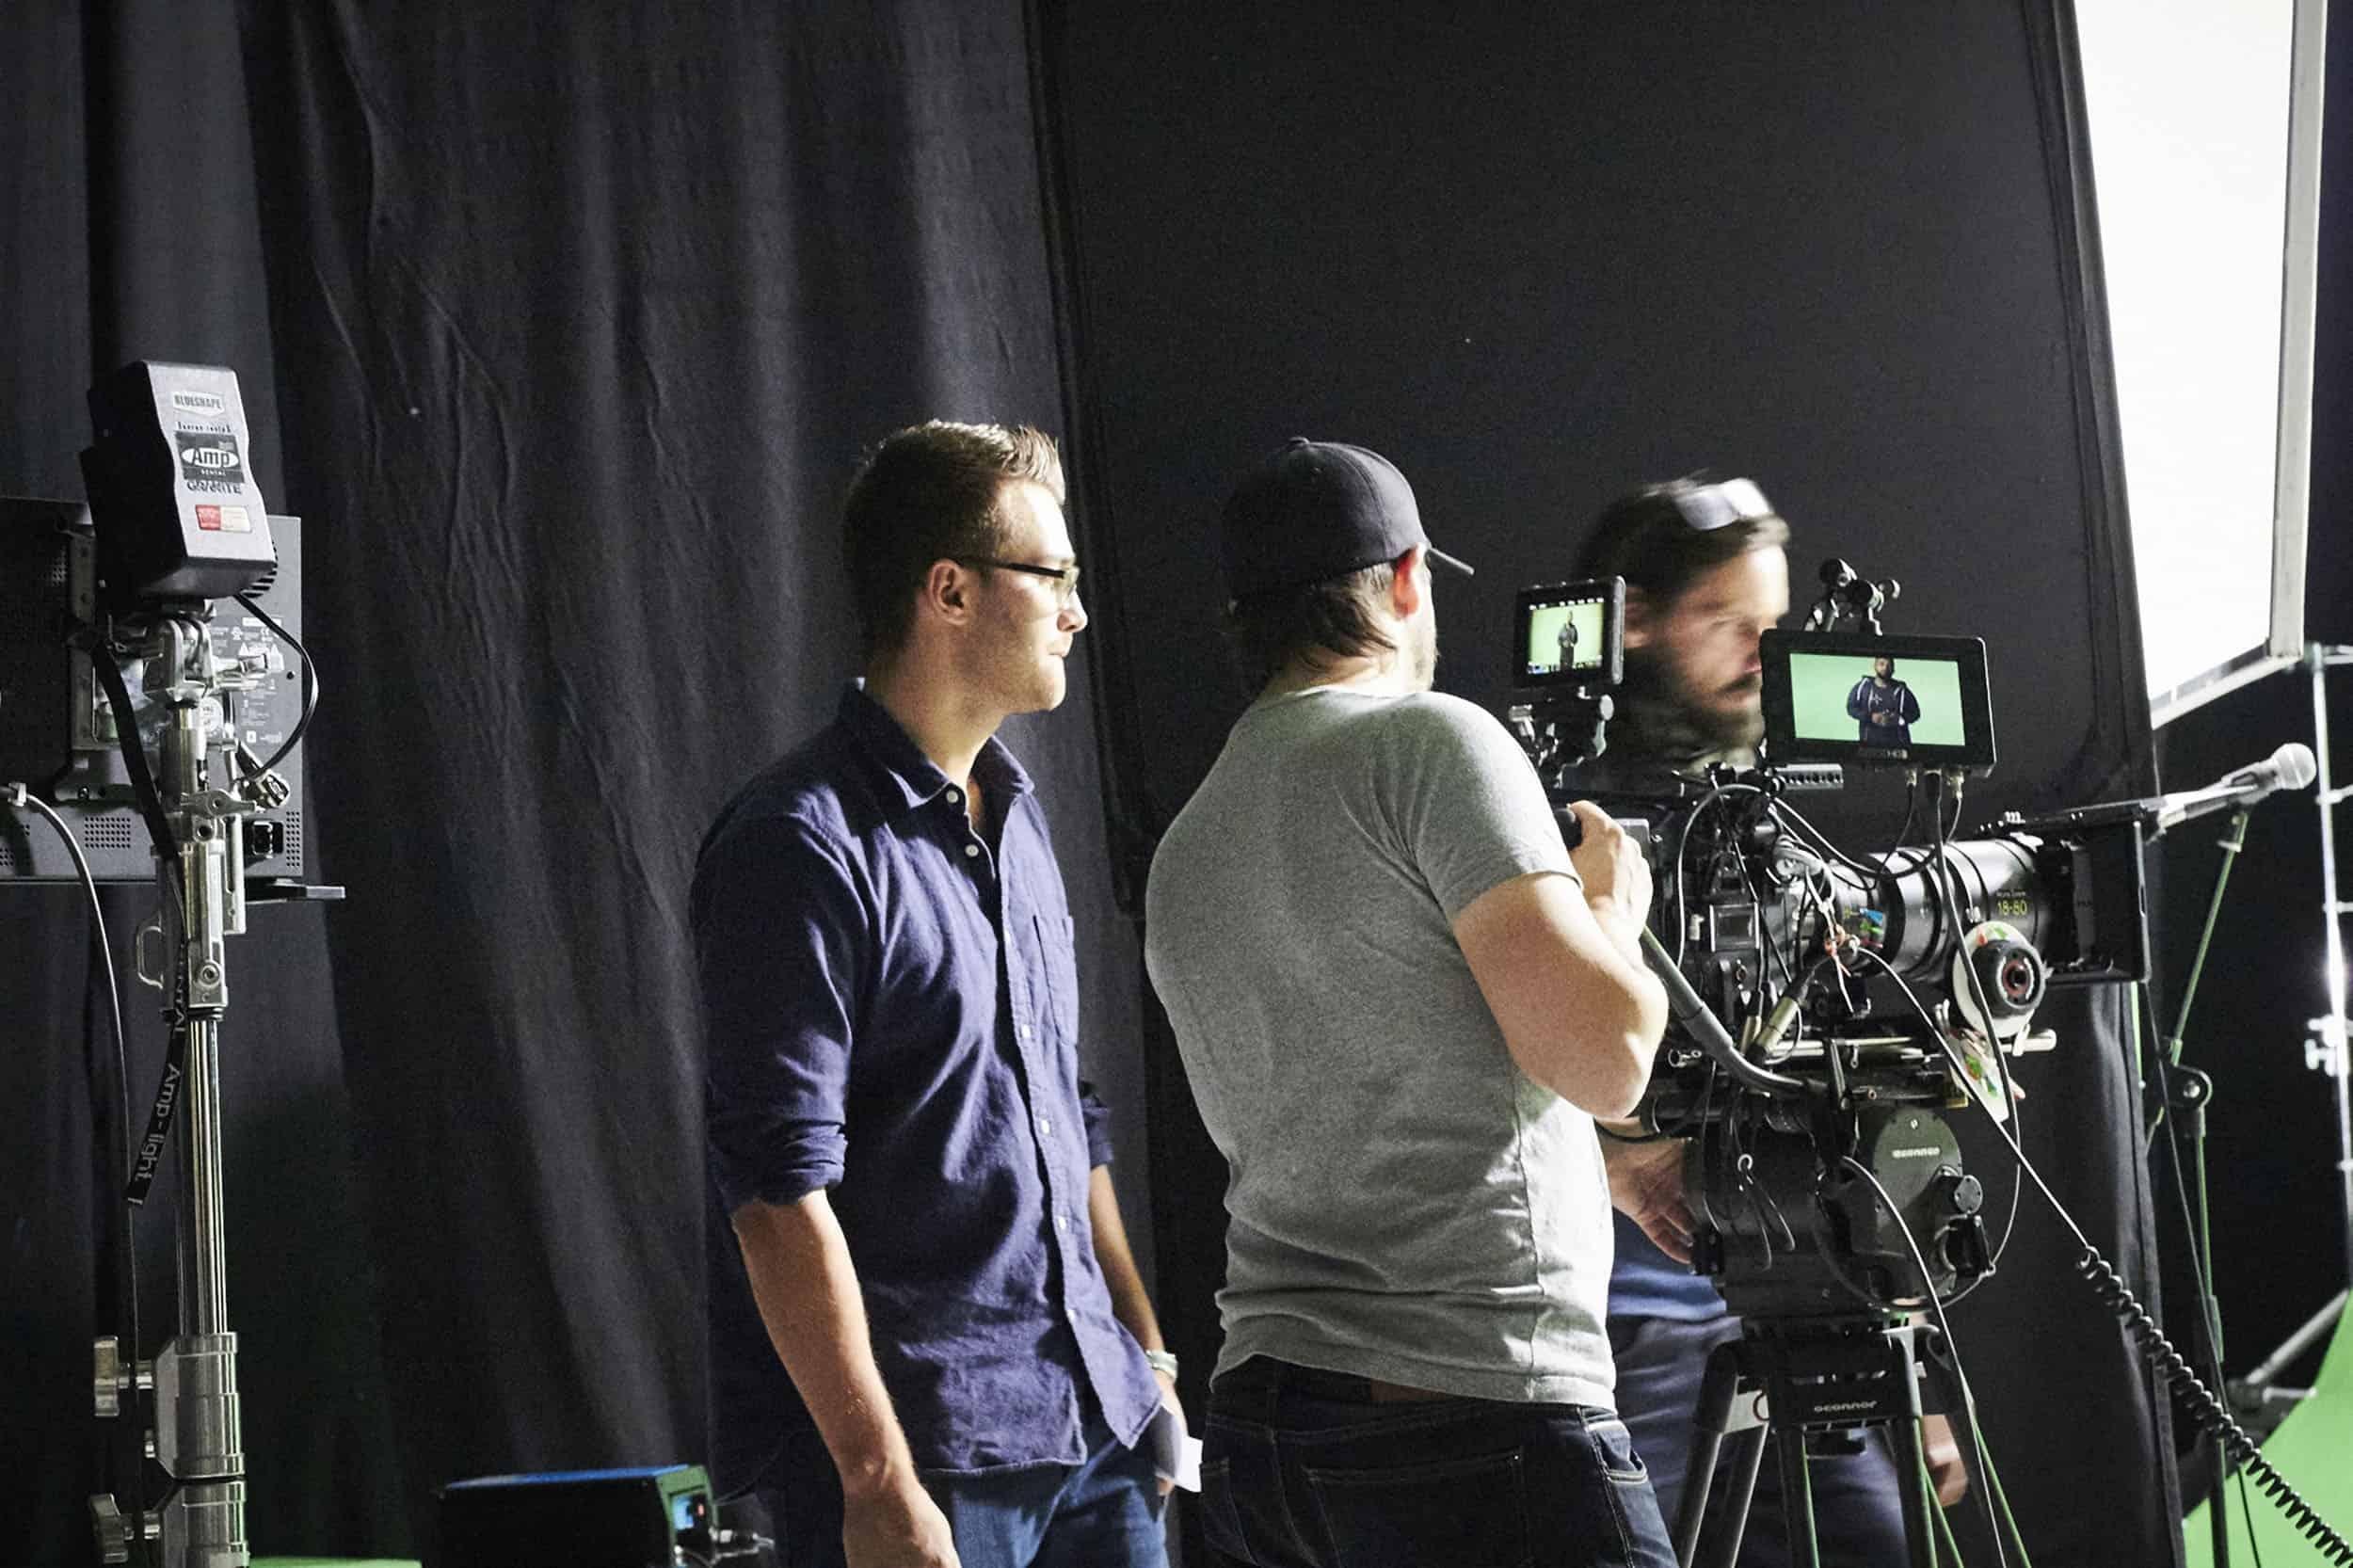 studio-ignatov-rolandversicherung-adokojo-tvcommercial-09